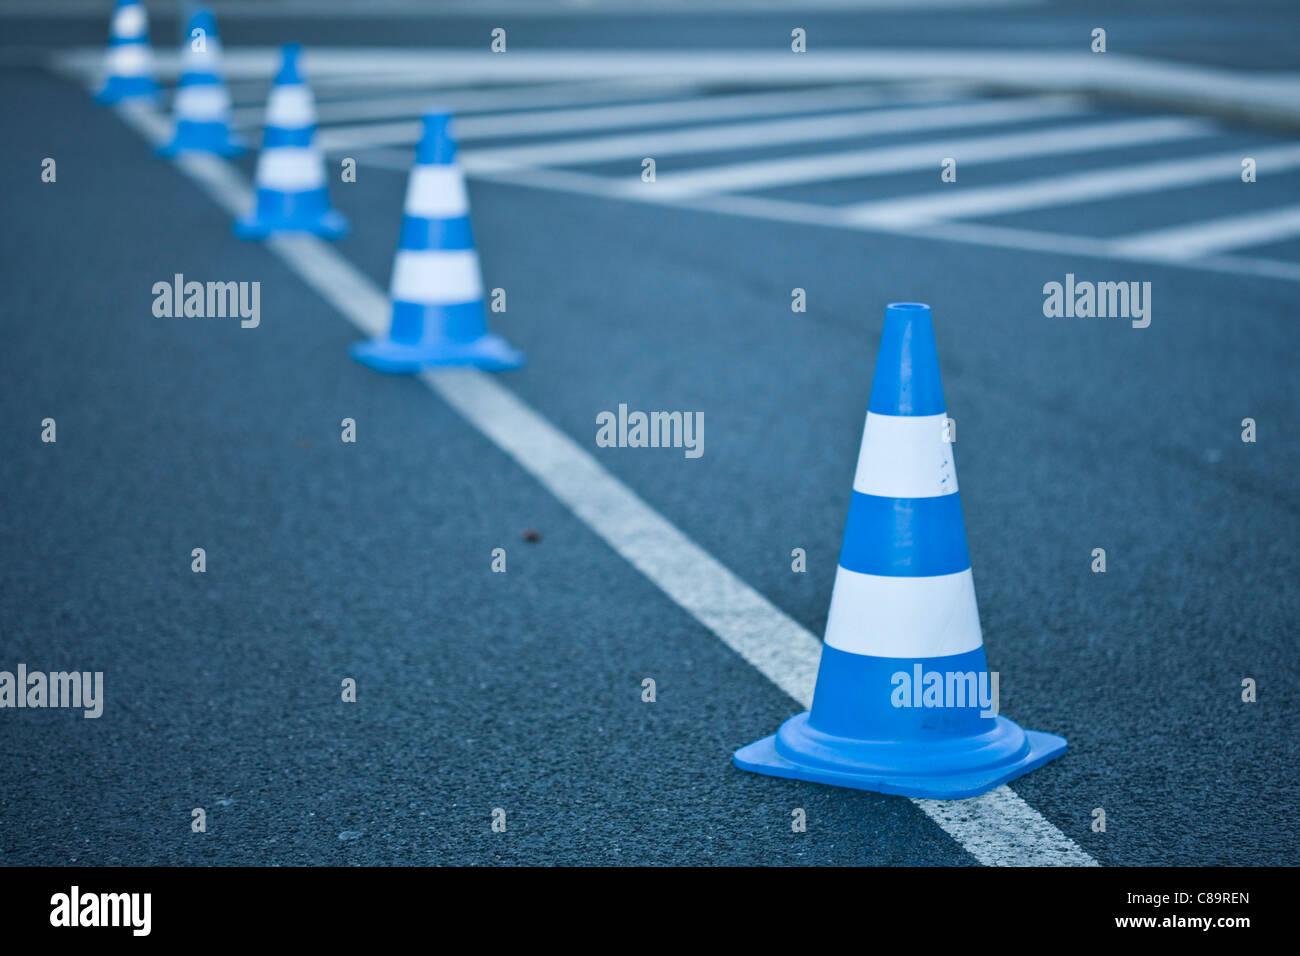 Germany, Wolfsburg, Traffic cones on road marking - Stock Image